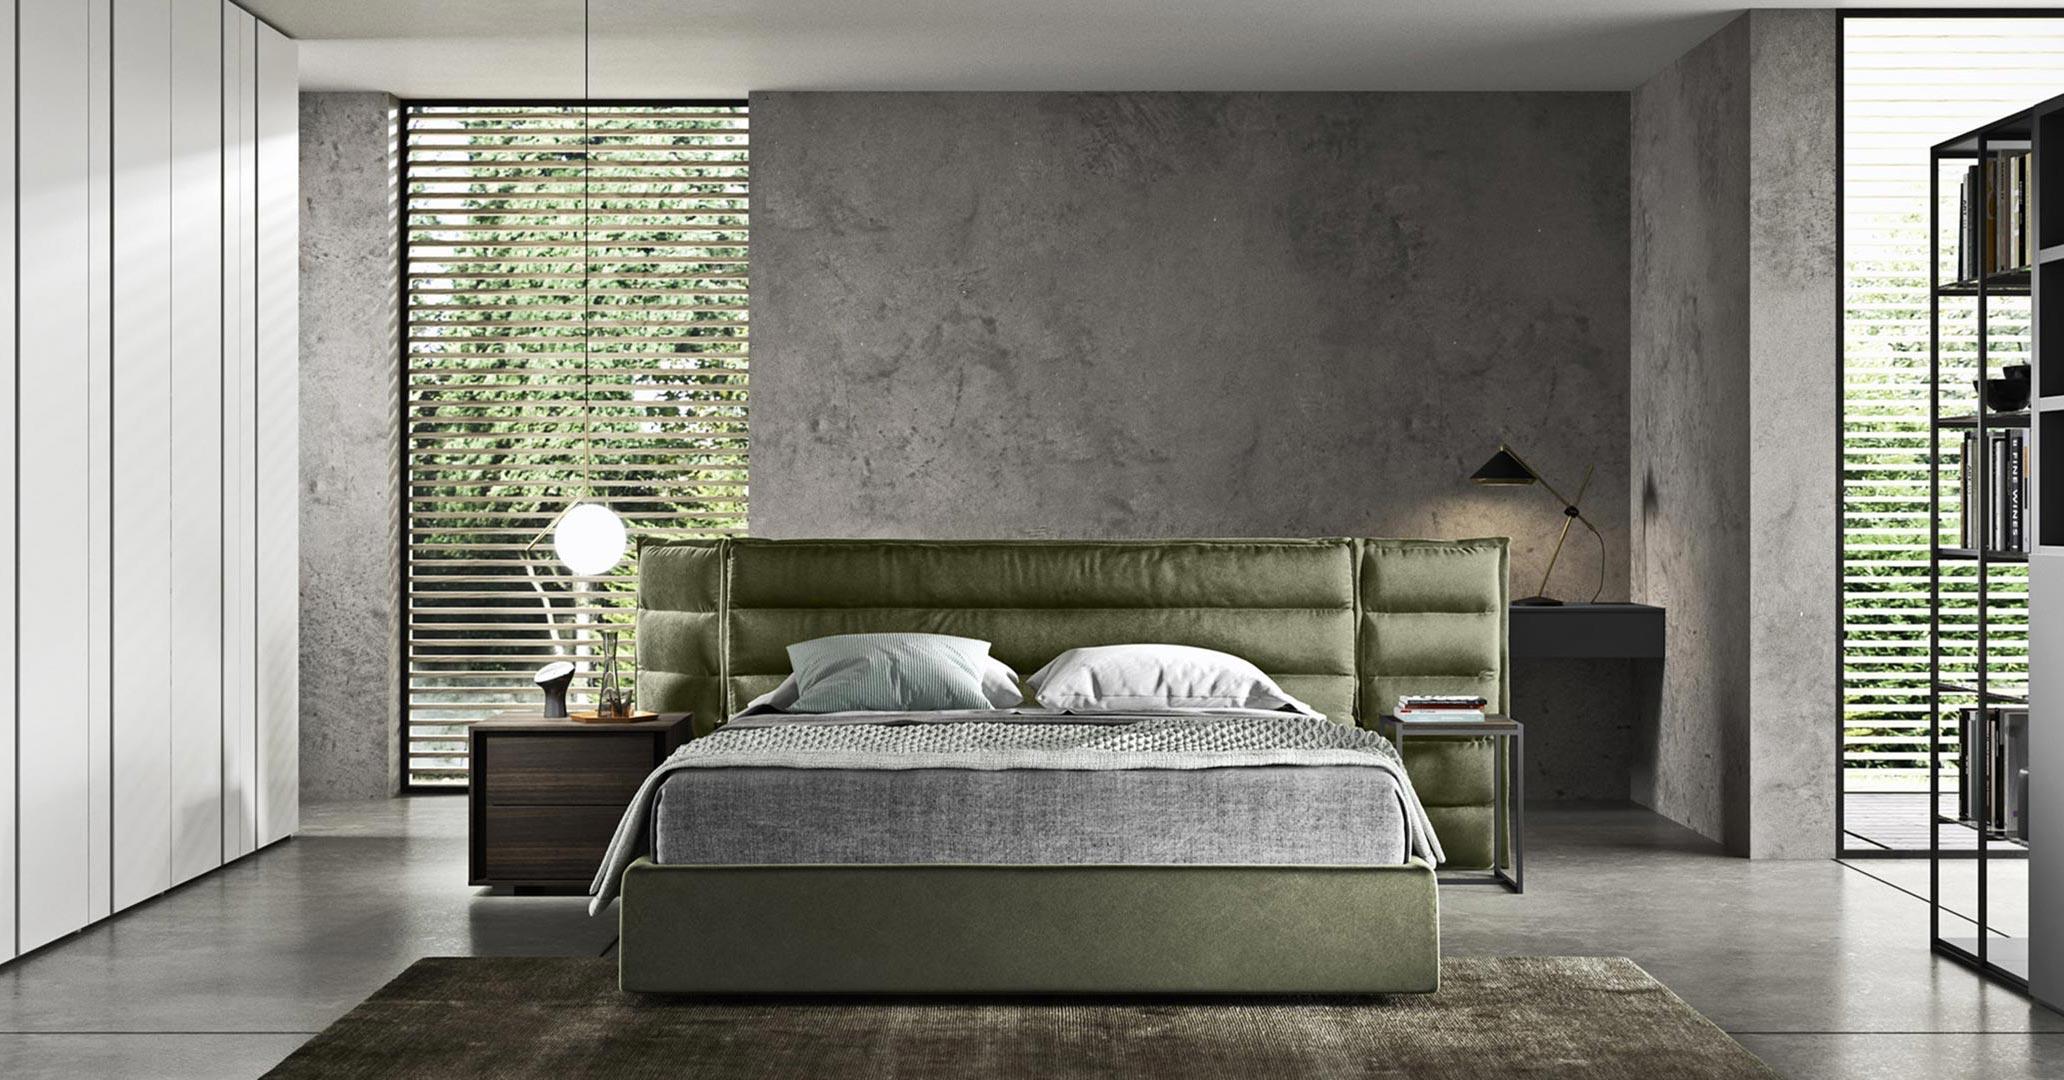 Libreria Design Camera Da Letto arredamenti moderni di design | mab home furniture